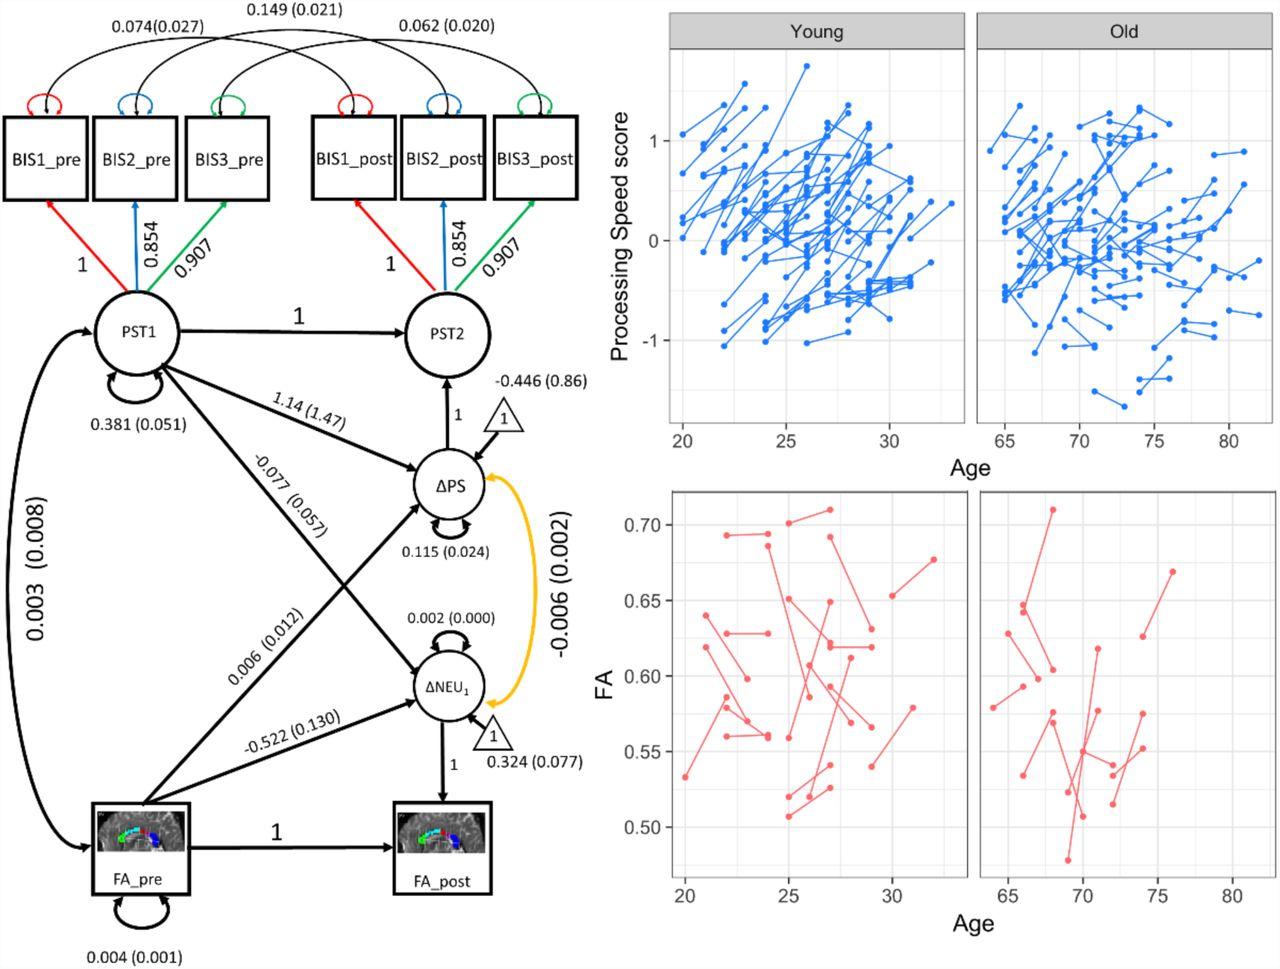 Developmental cognitive neuroscience using Latent Change Score